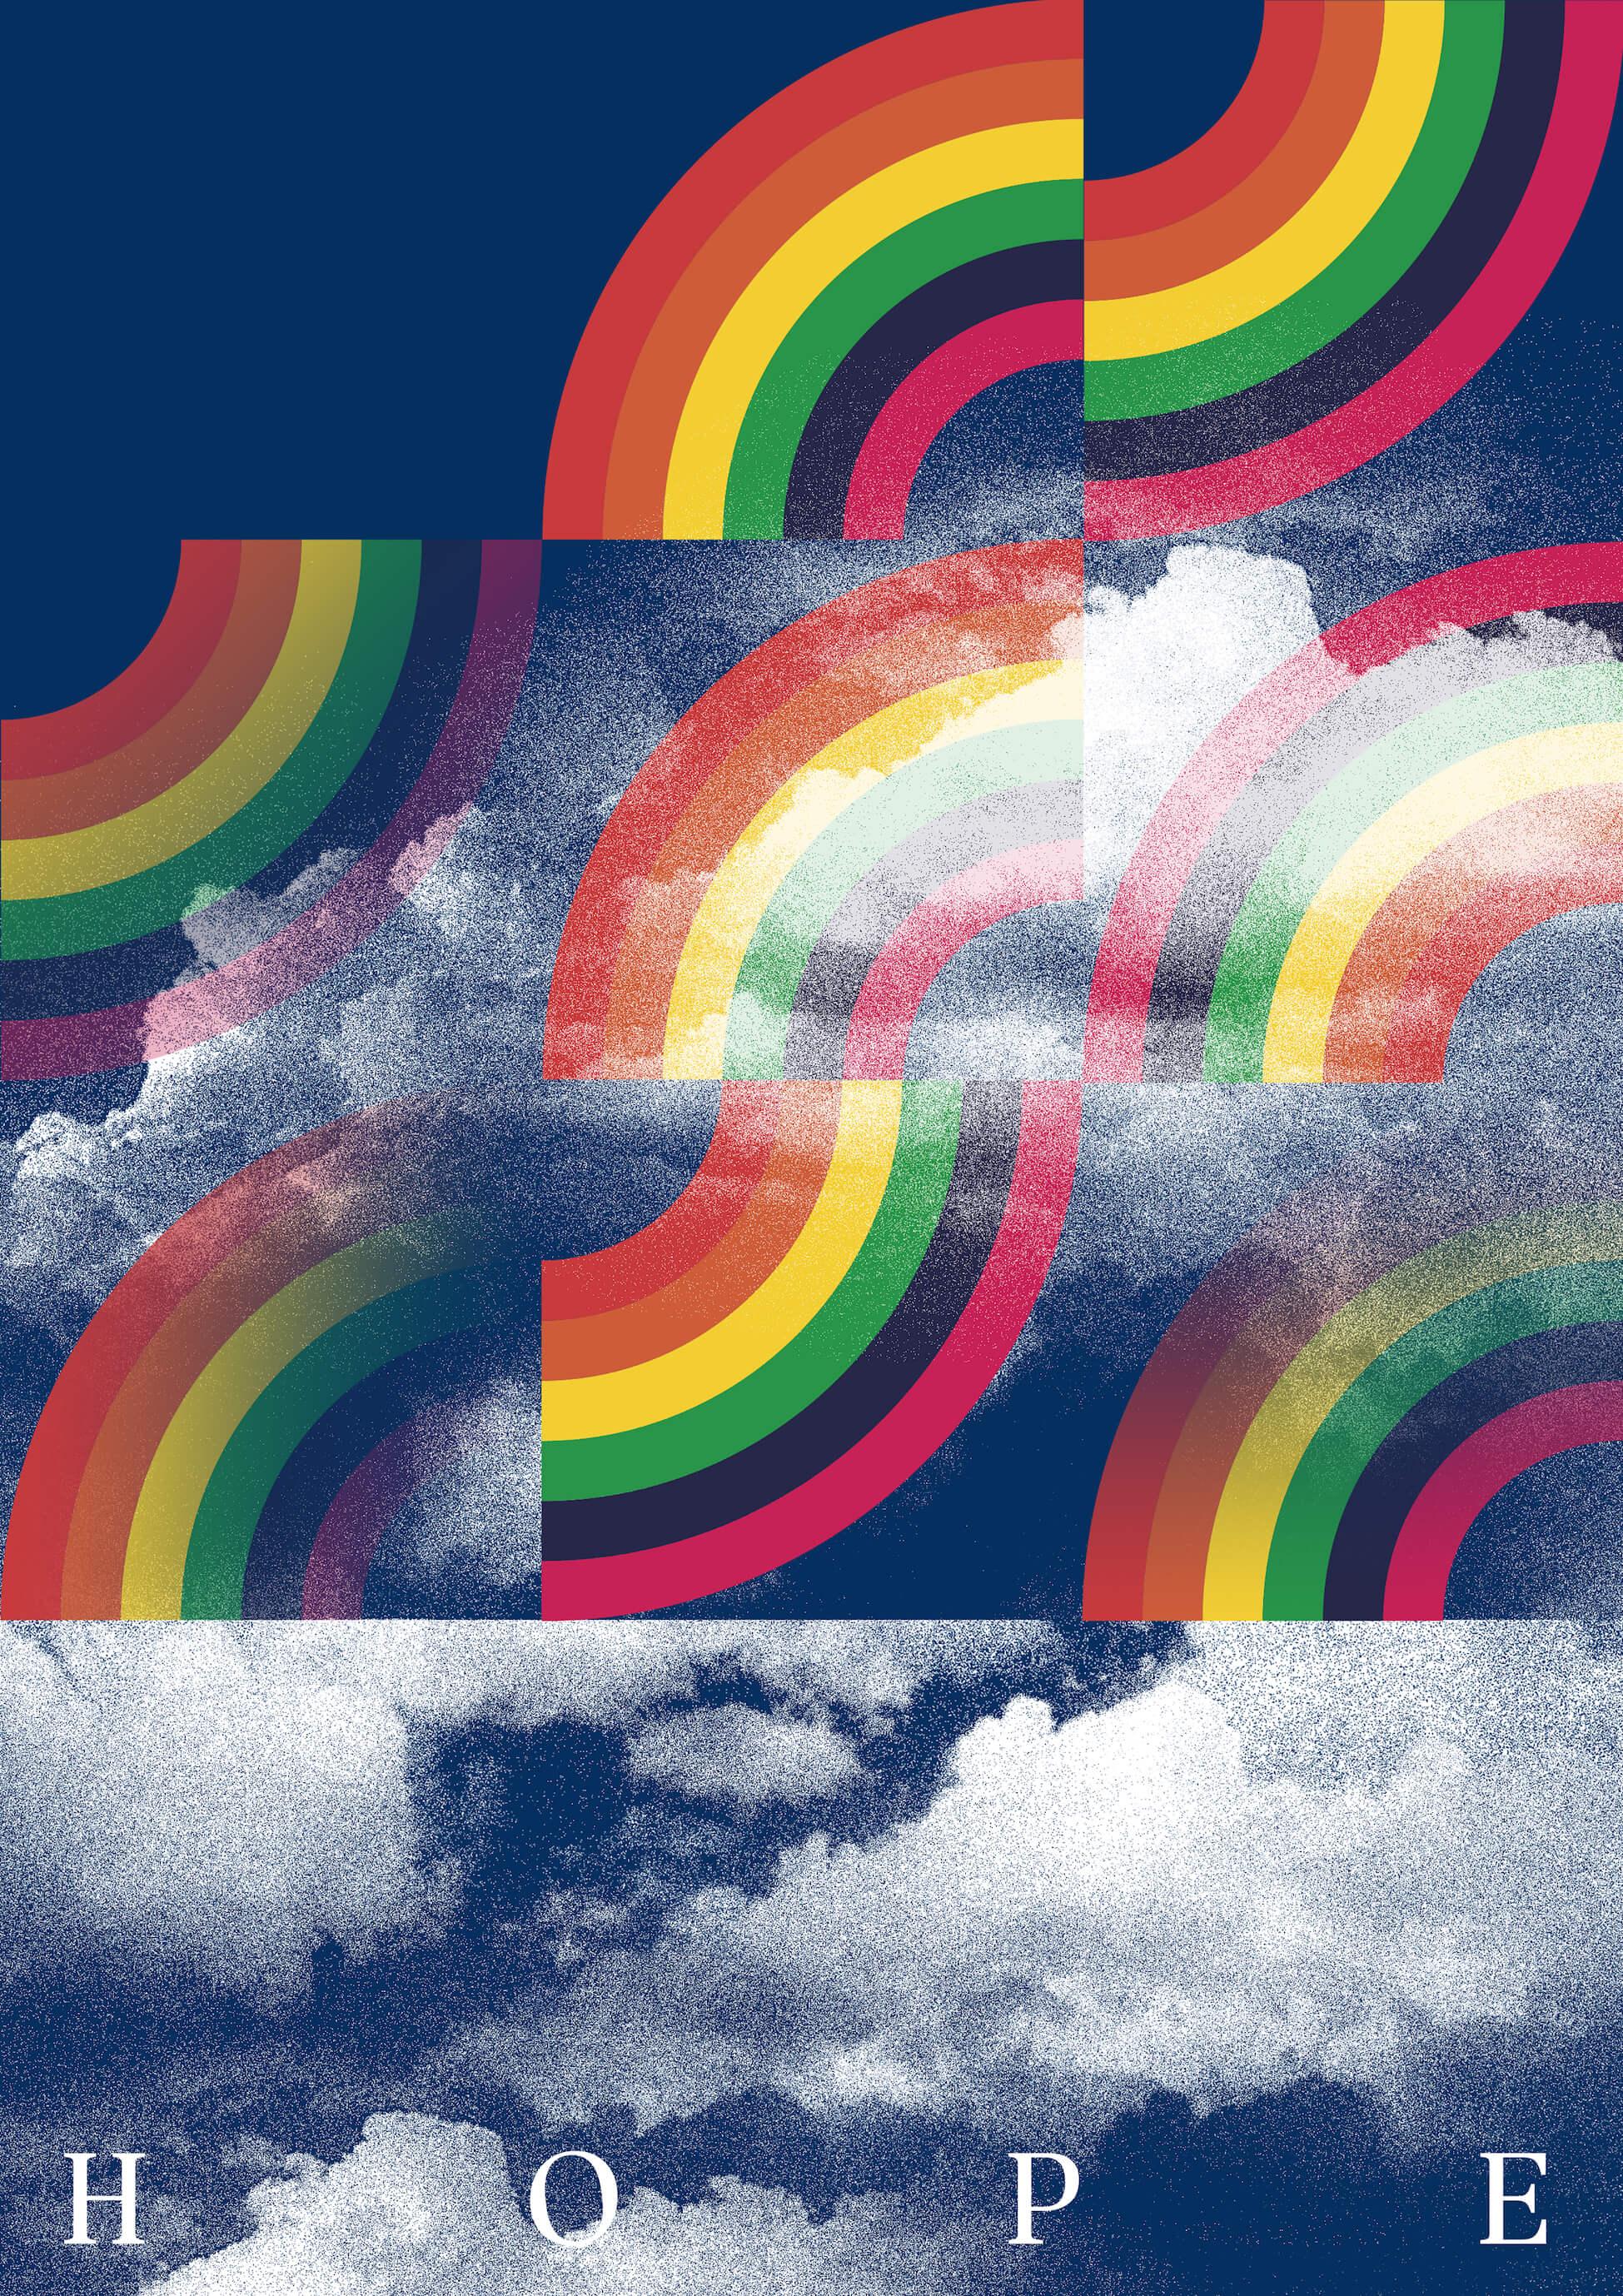 Hopre For Rainbow main image